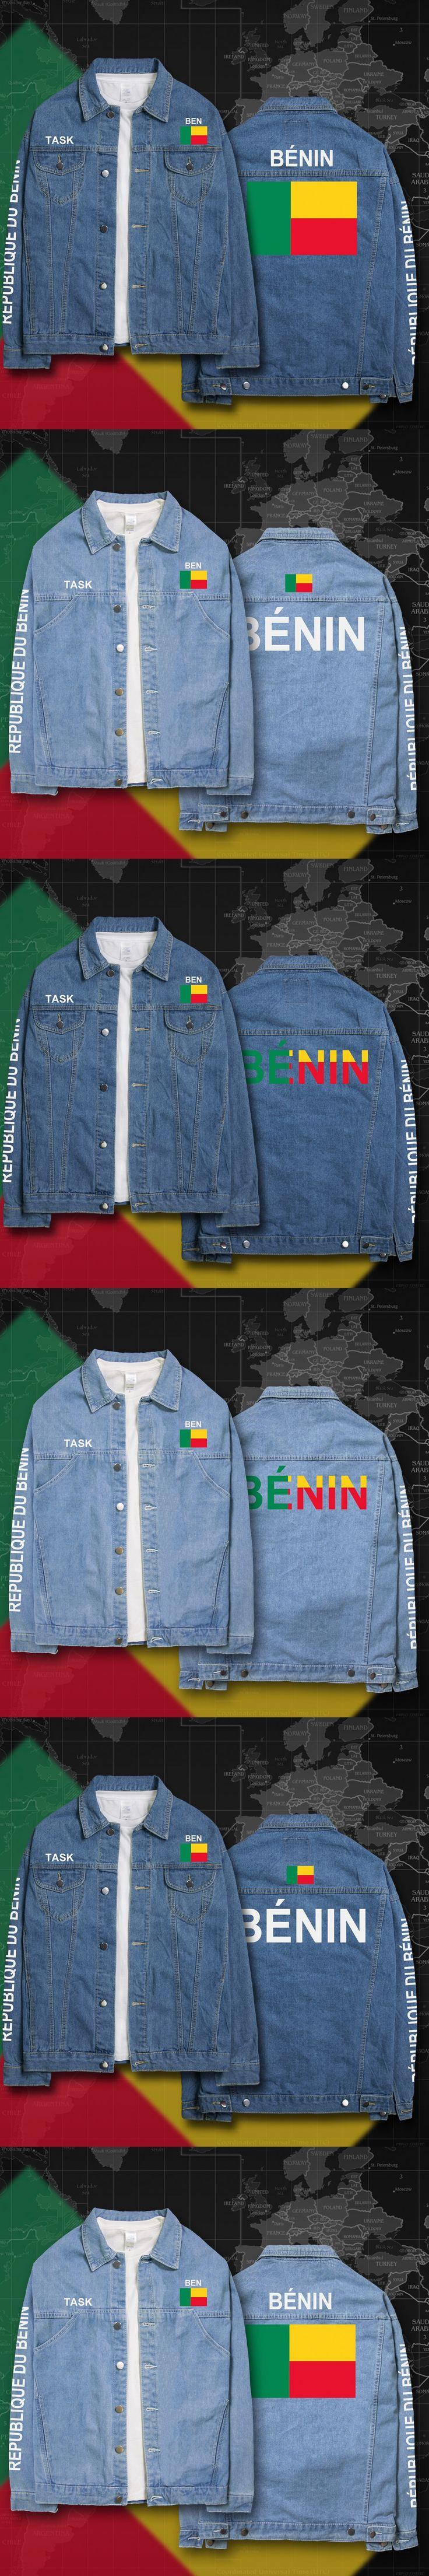 Benin Beninese BEN BJ Dahomey denim jackets men coat men's suits jeans jacket thin jaquetas 2017 sunscreen autumn spring nation